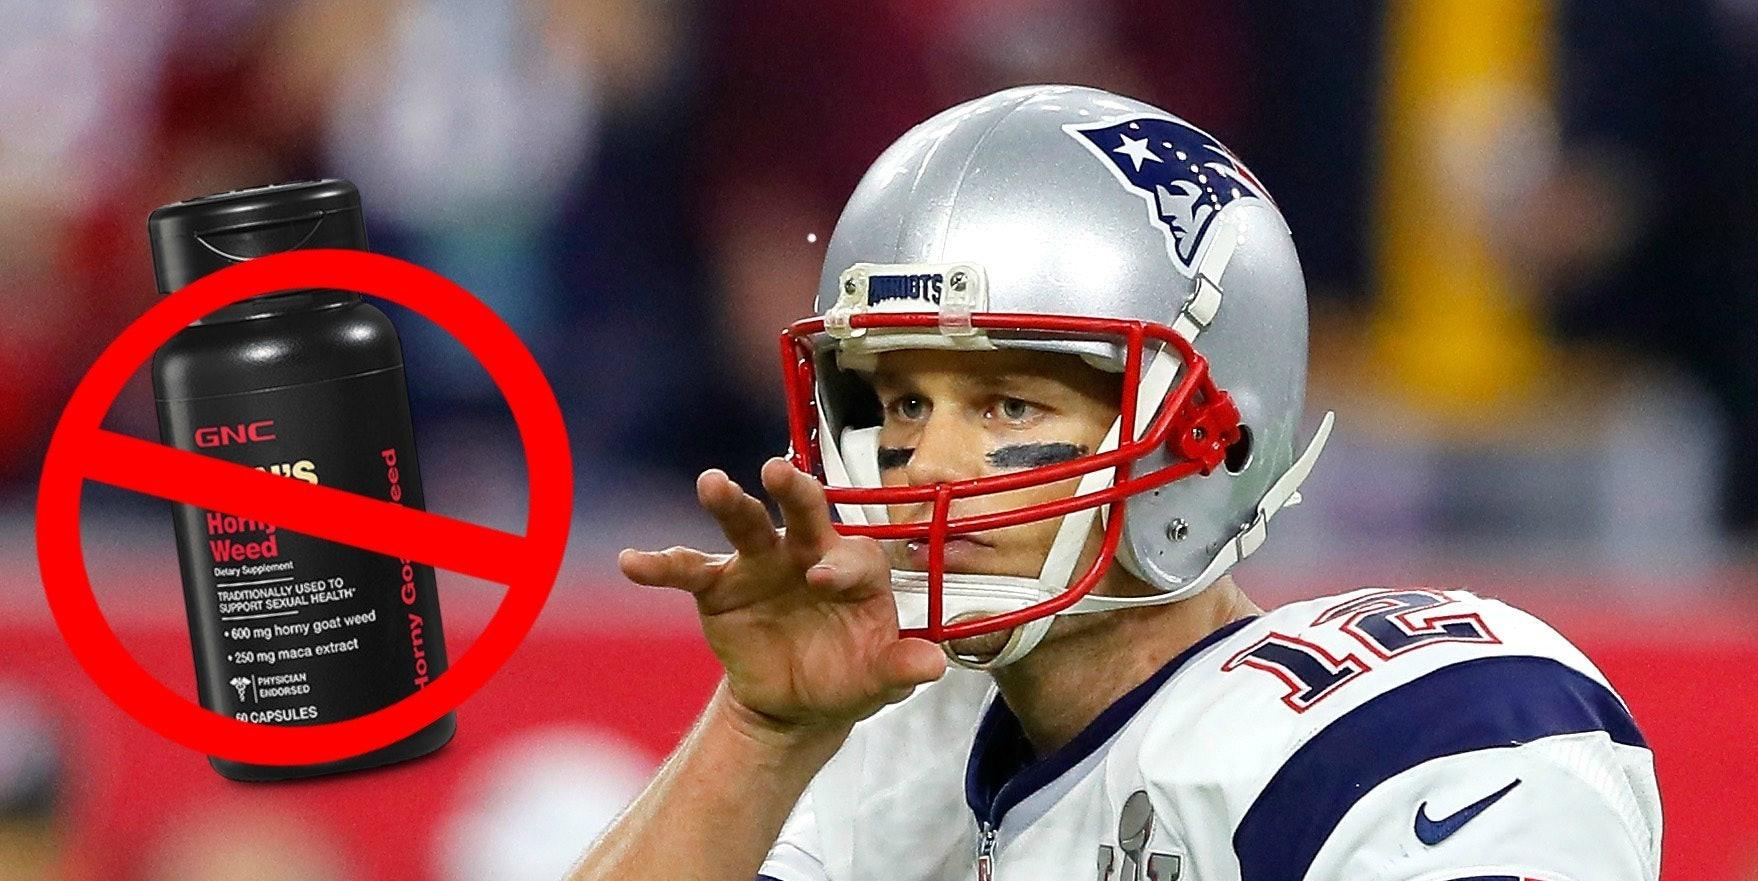 GNC Peddles Trash So the NFL Banned Its Super Bowl Ad